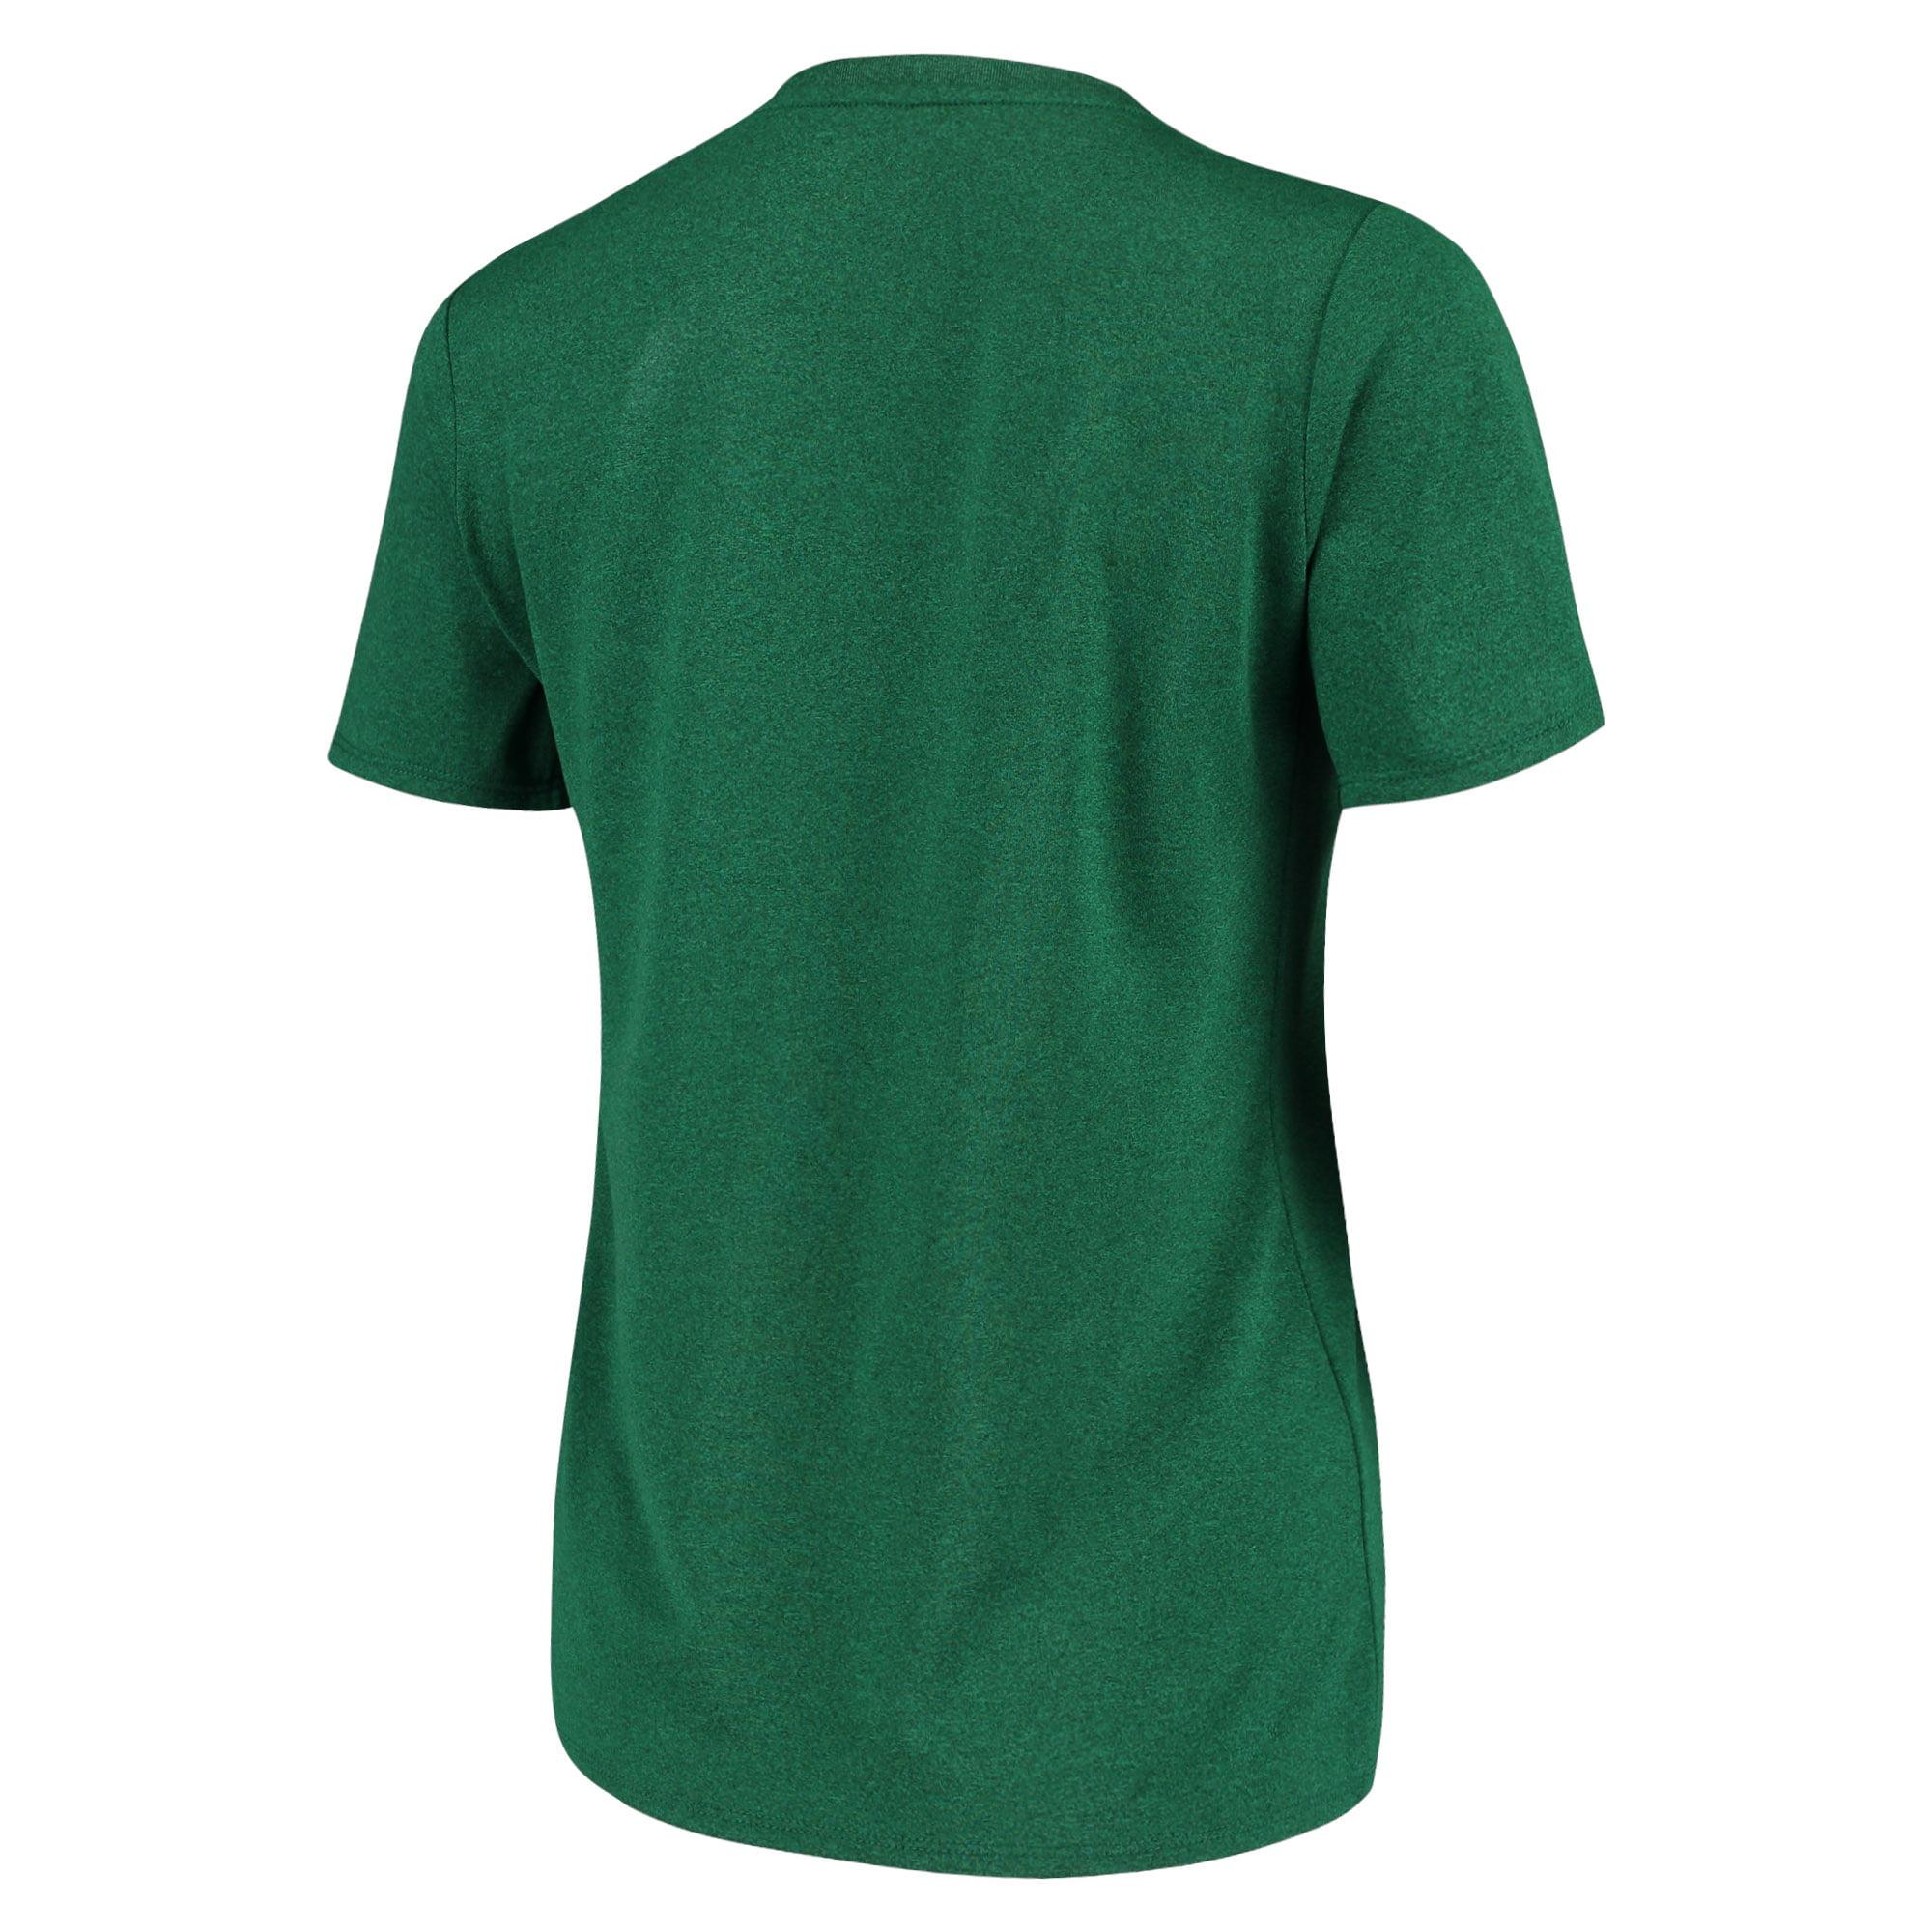 c2b59930c490 Boston Celtics Nike Women s Team Name Performance V-Neck T-Shirt - Kelly  Green - Walmart.com